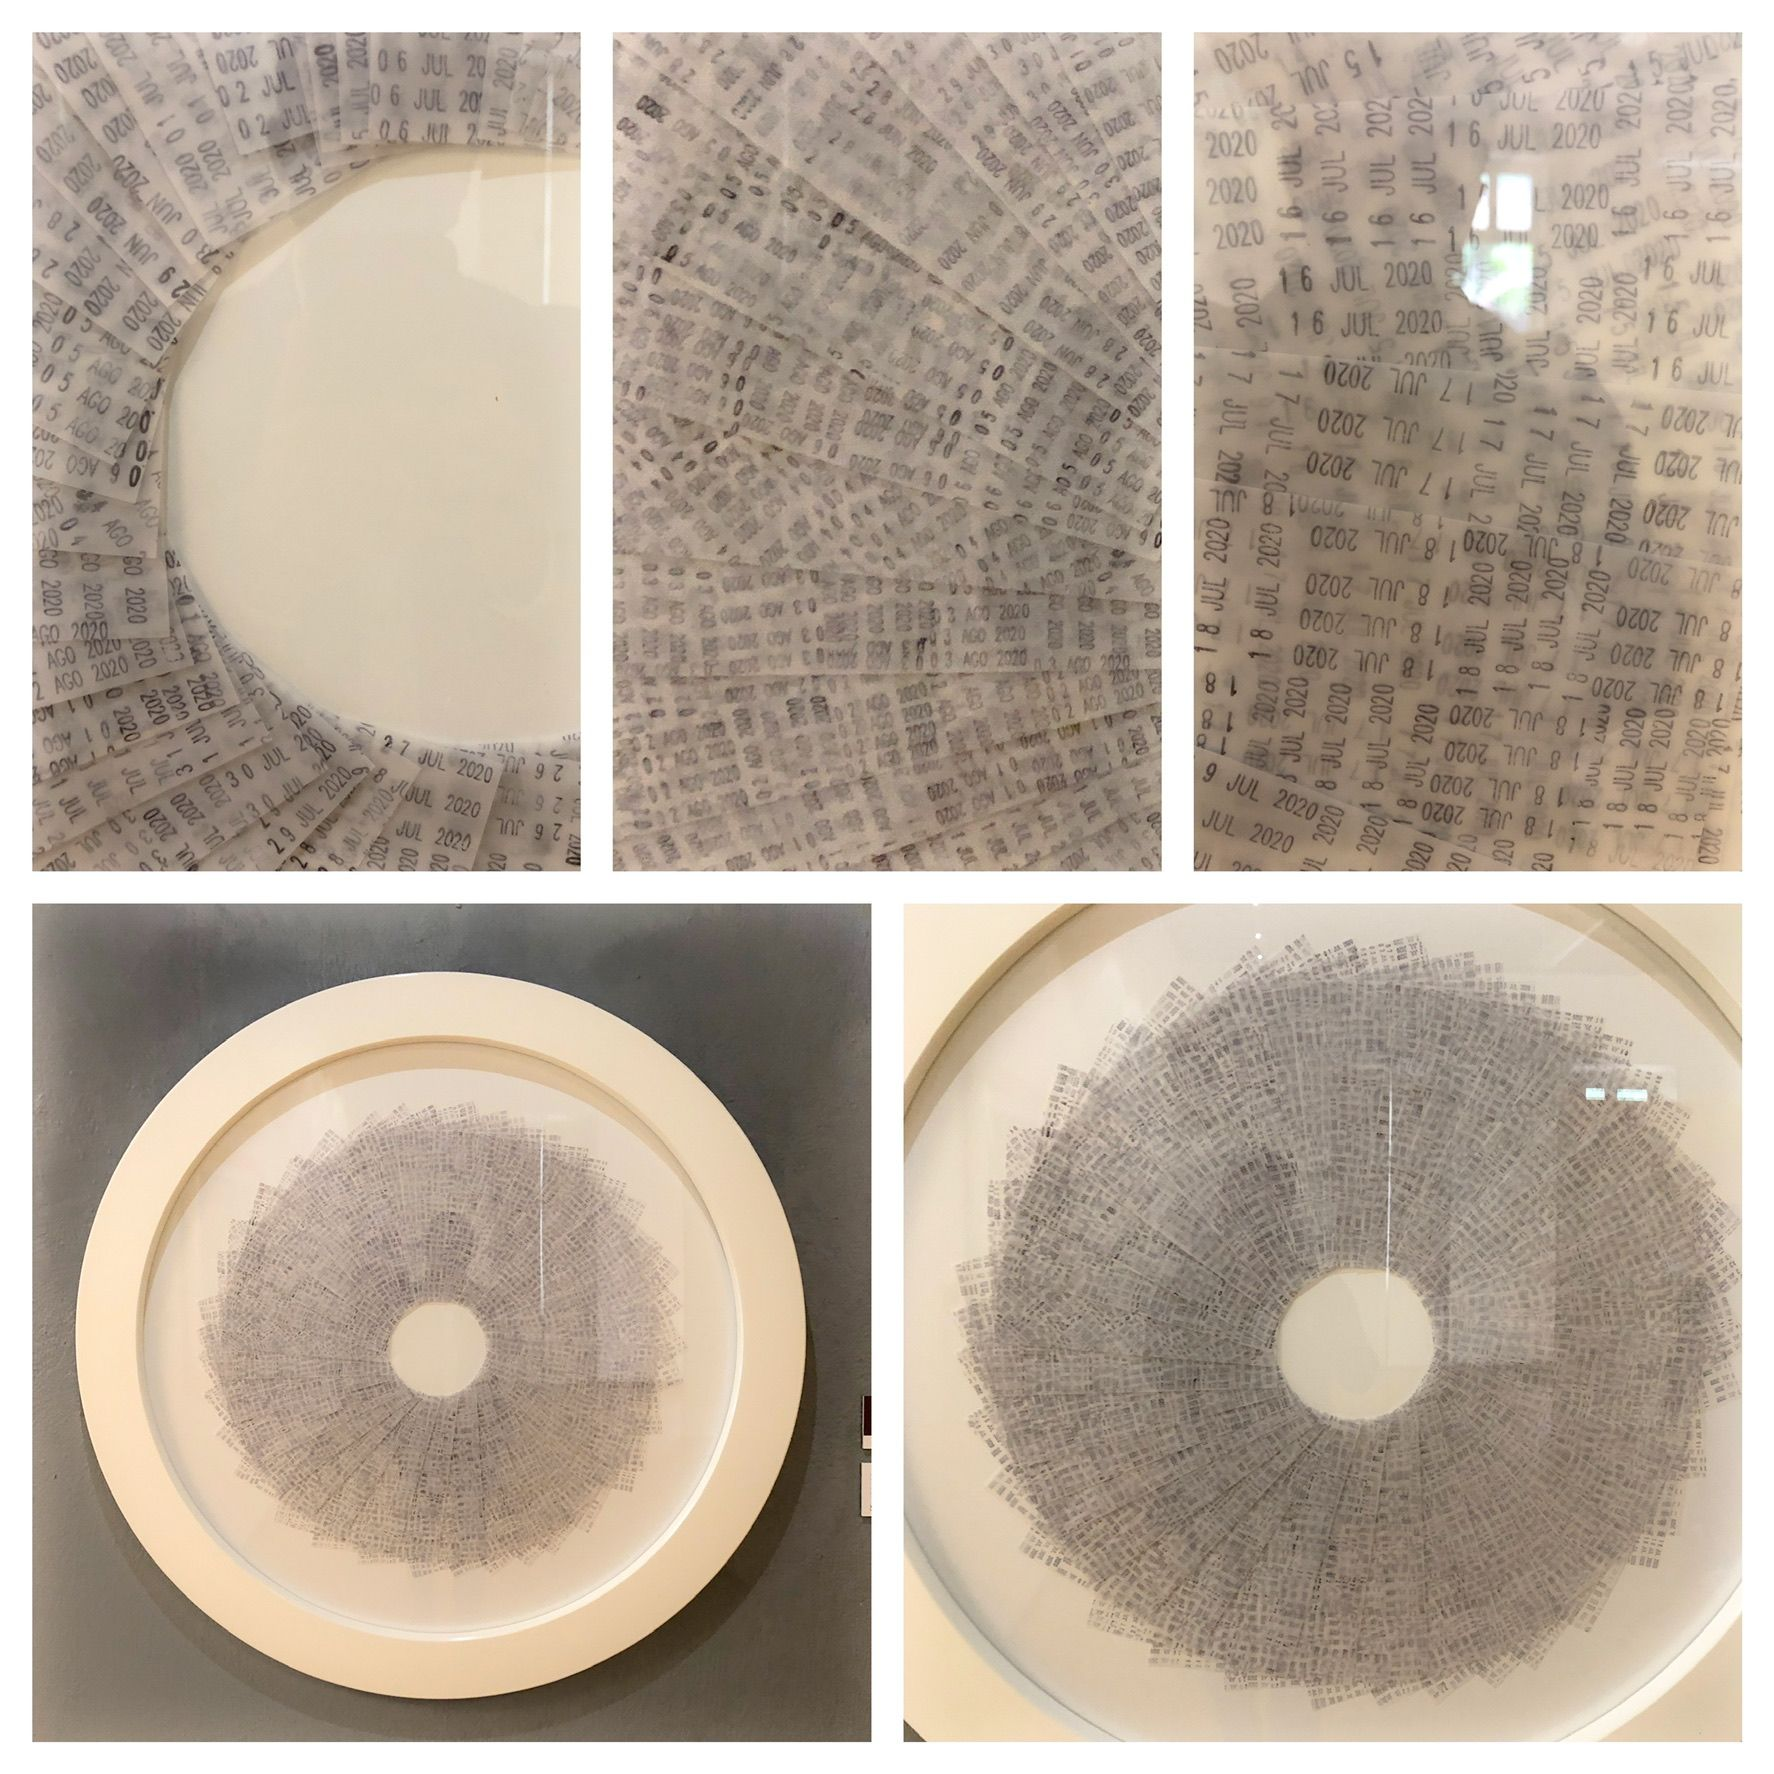 Detail Circular Quarantine 2020, date stamp, inks on paper.